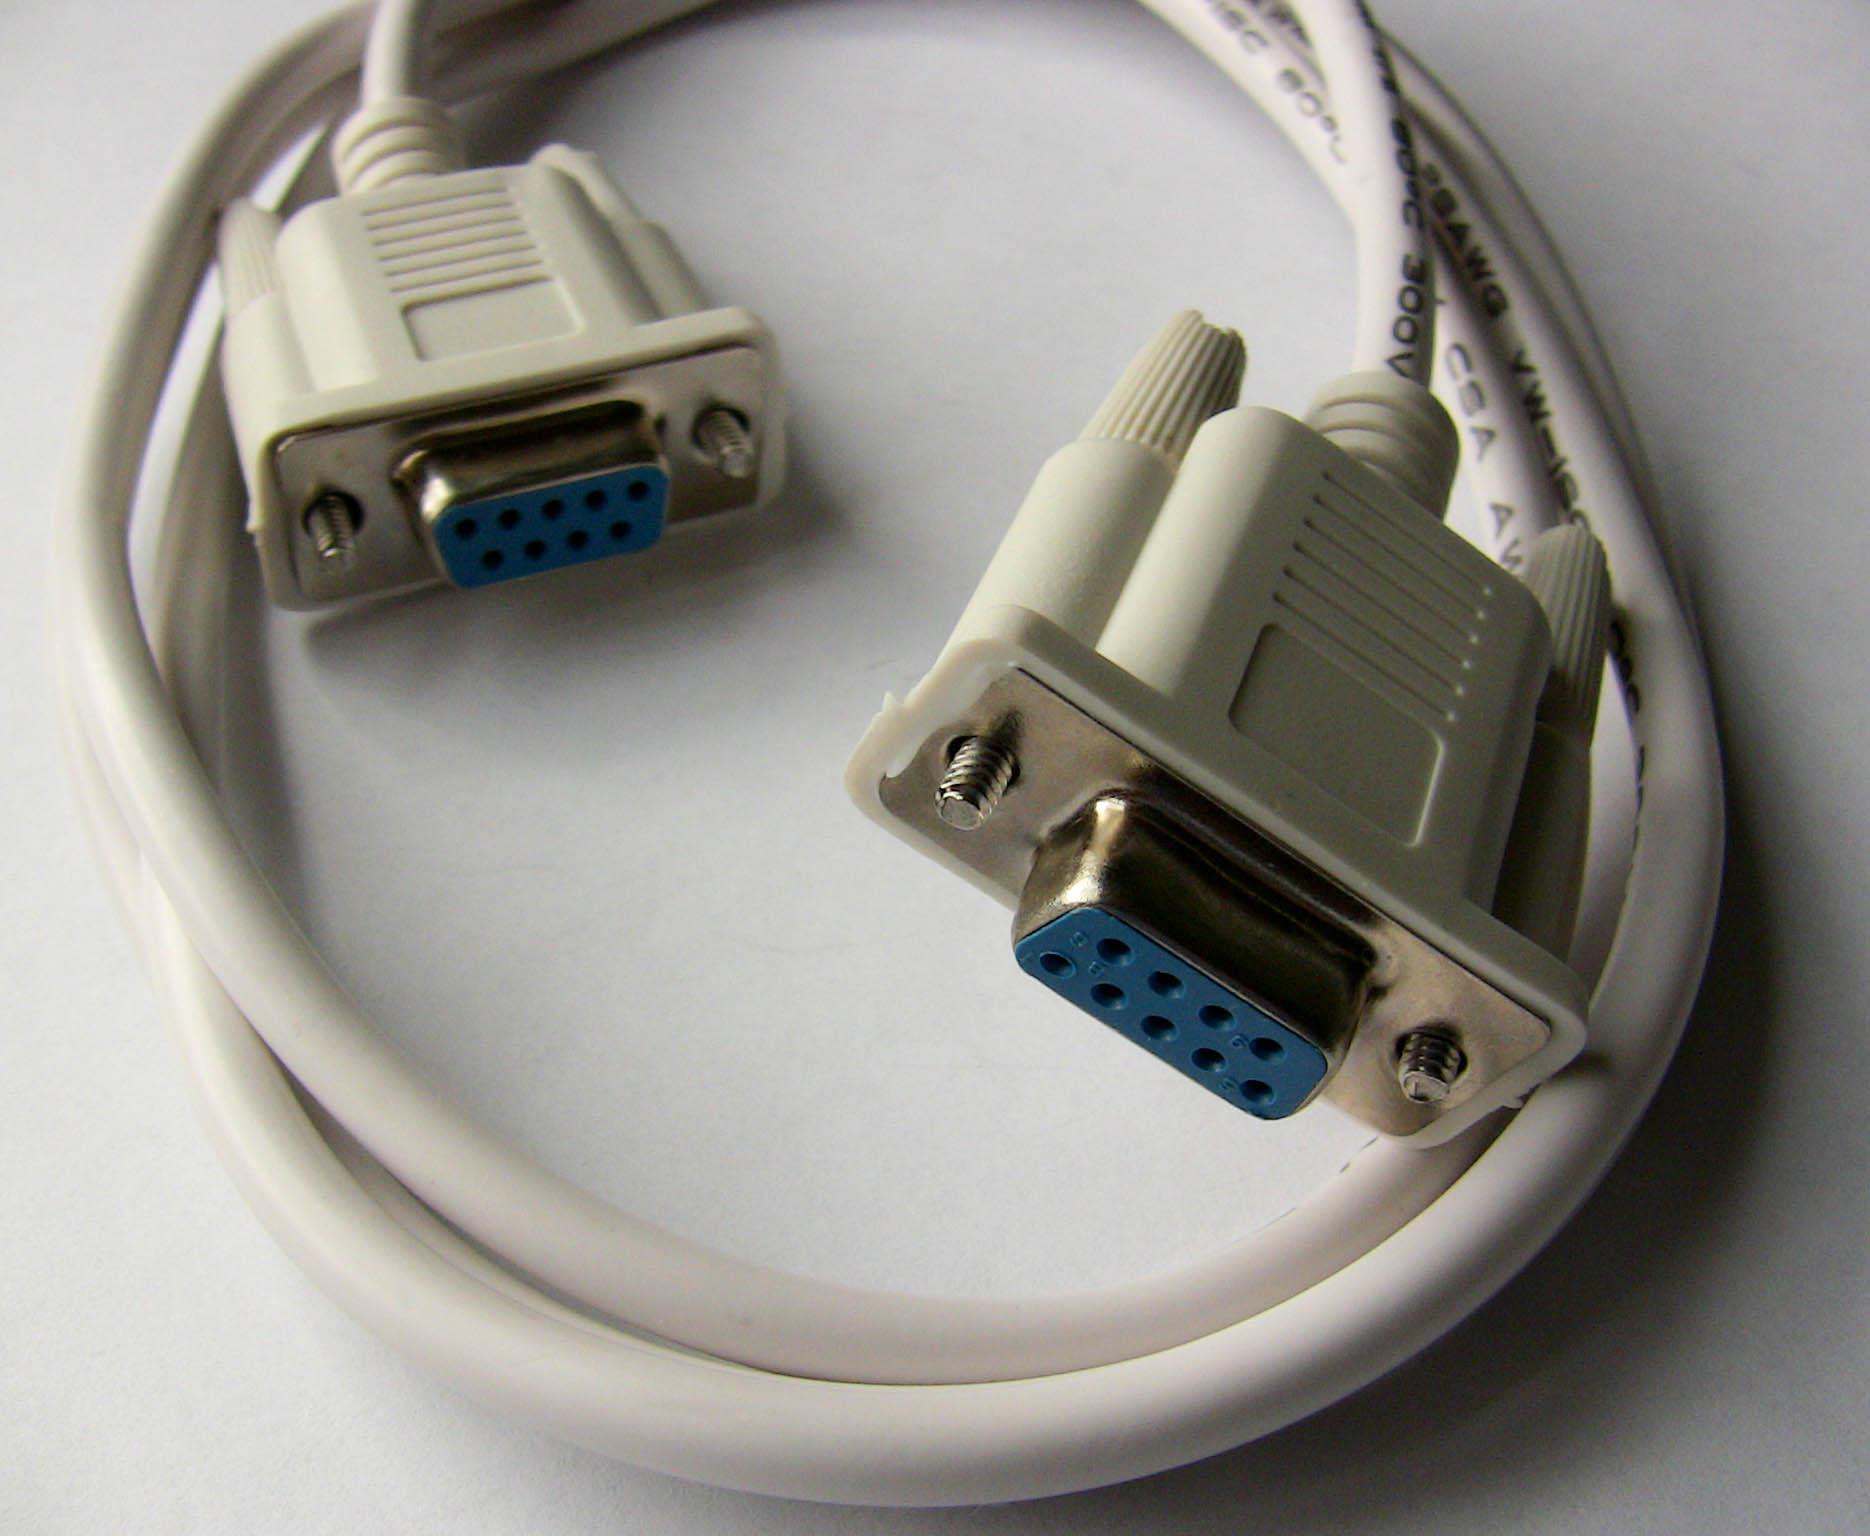 схема переходника с usb на com-порт (rs232)